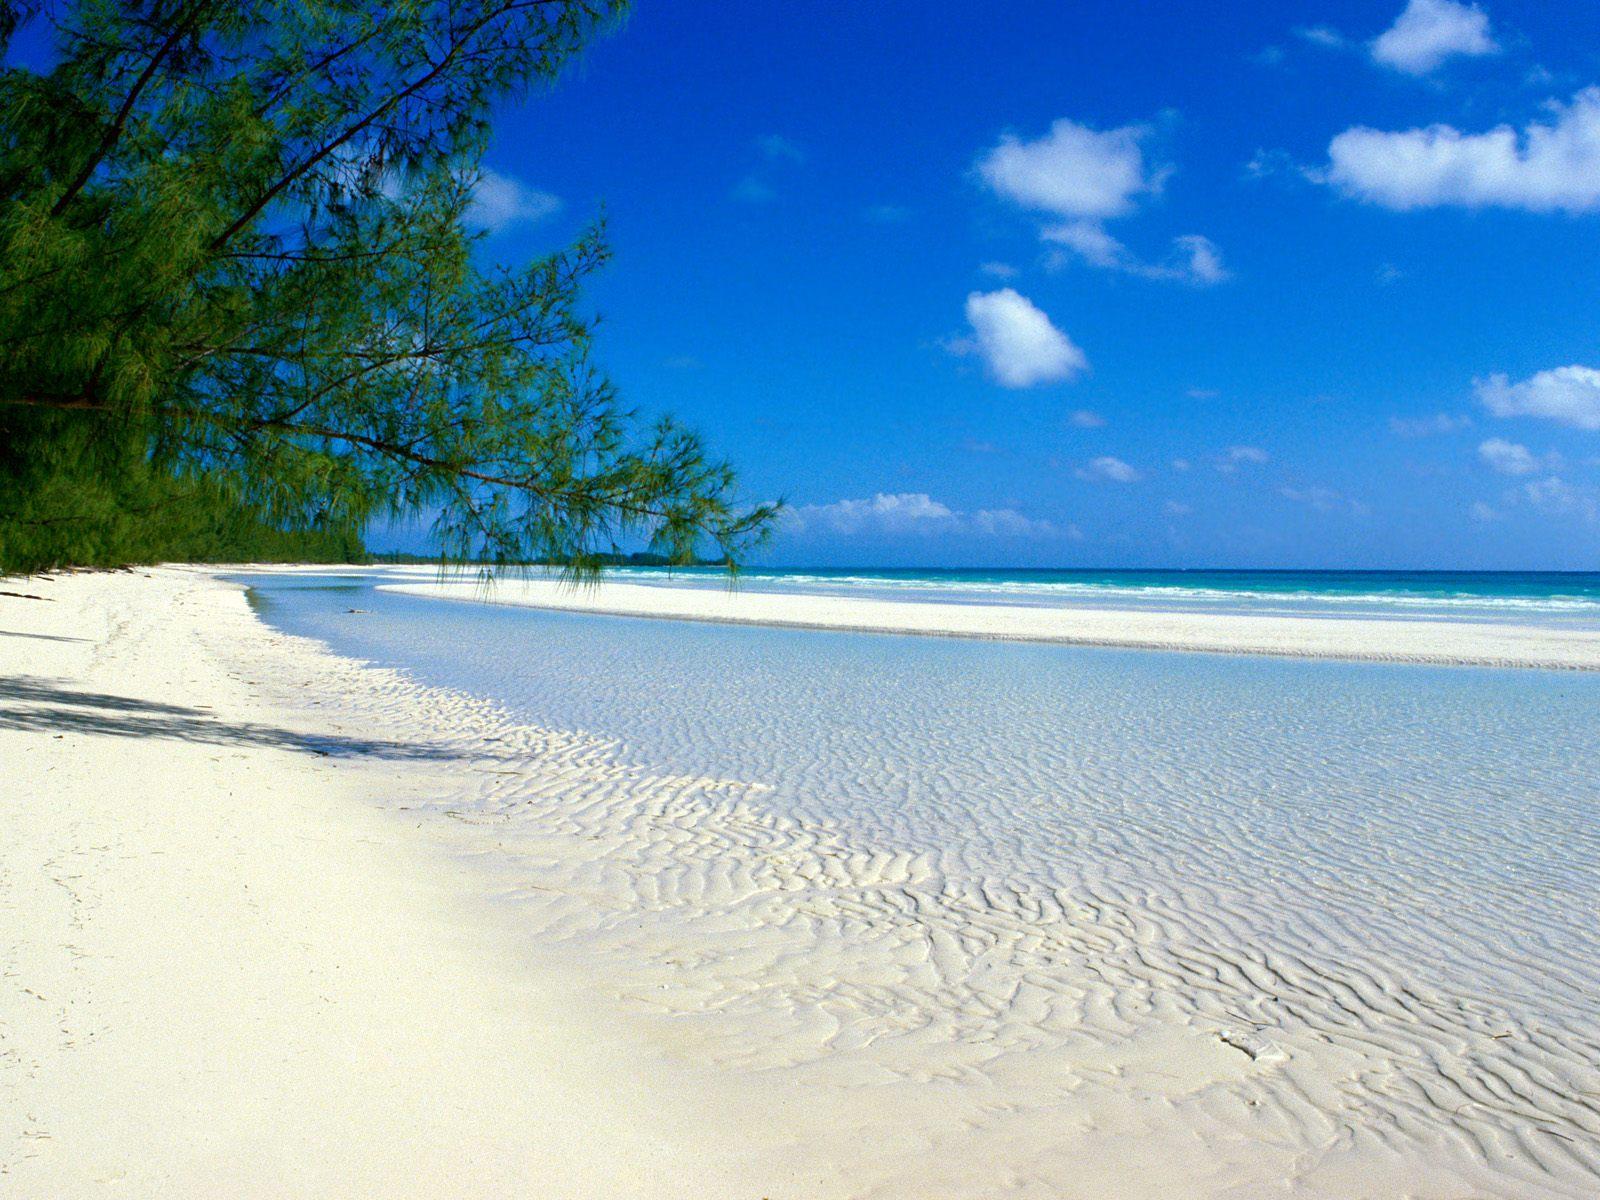 http://1.bp.blogspot.com/_6vQUmqm2JkQ/TTvsPLUsoBI/AAAAAAAAHwc/o8NwH2GFDTE/s1600/photos-of-Taino-Beach-Bahamas-pictures.jpg